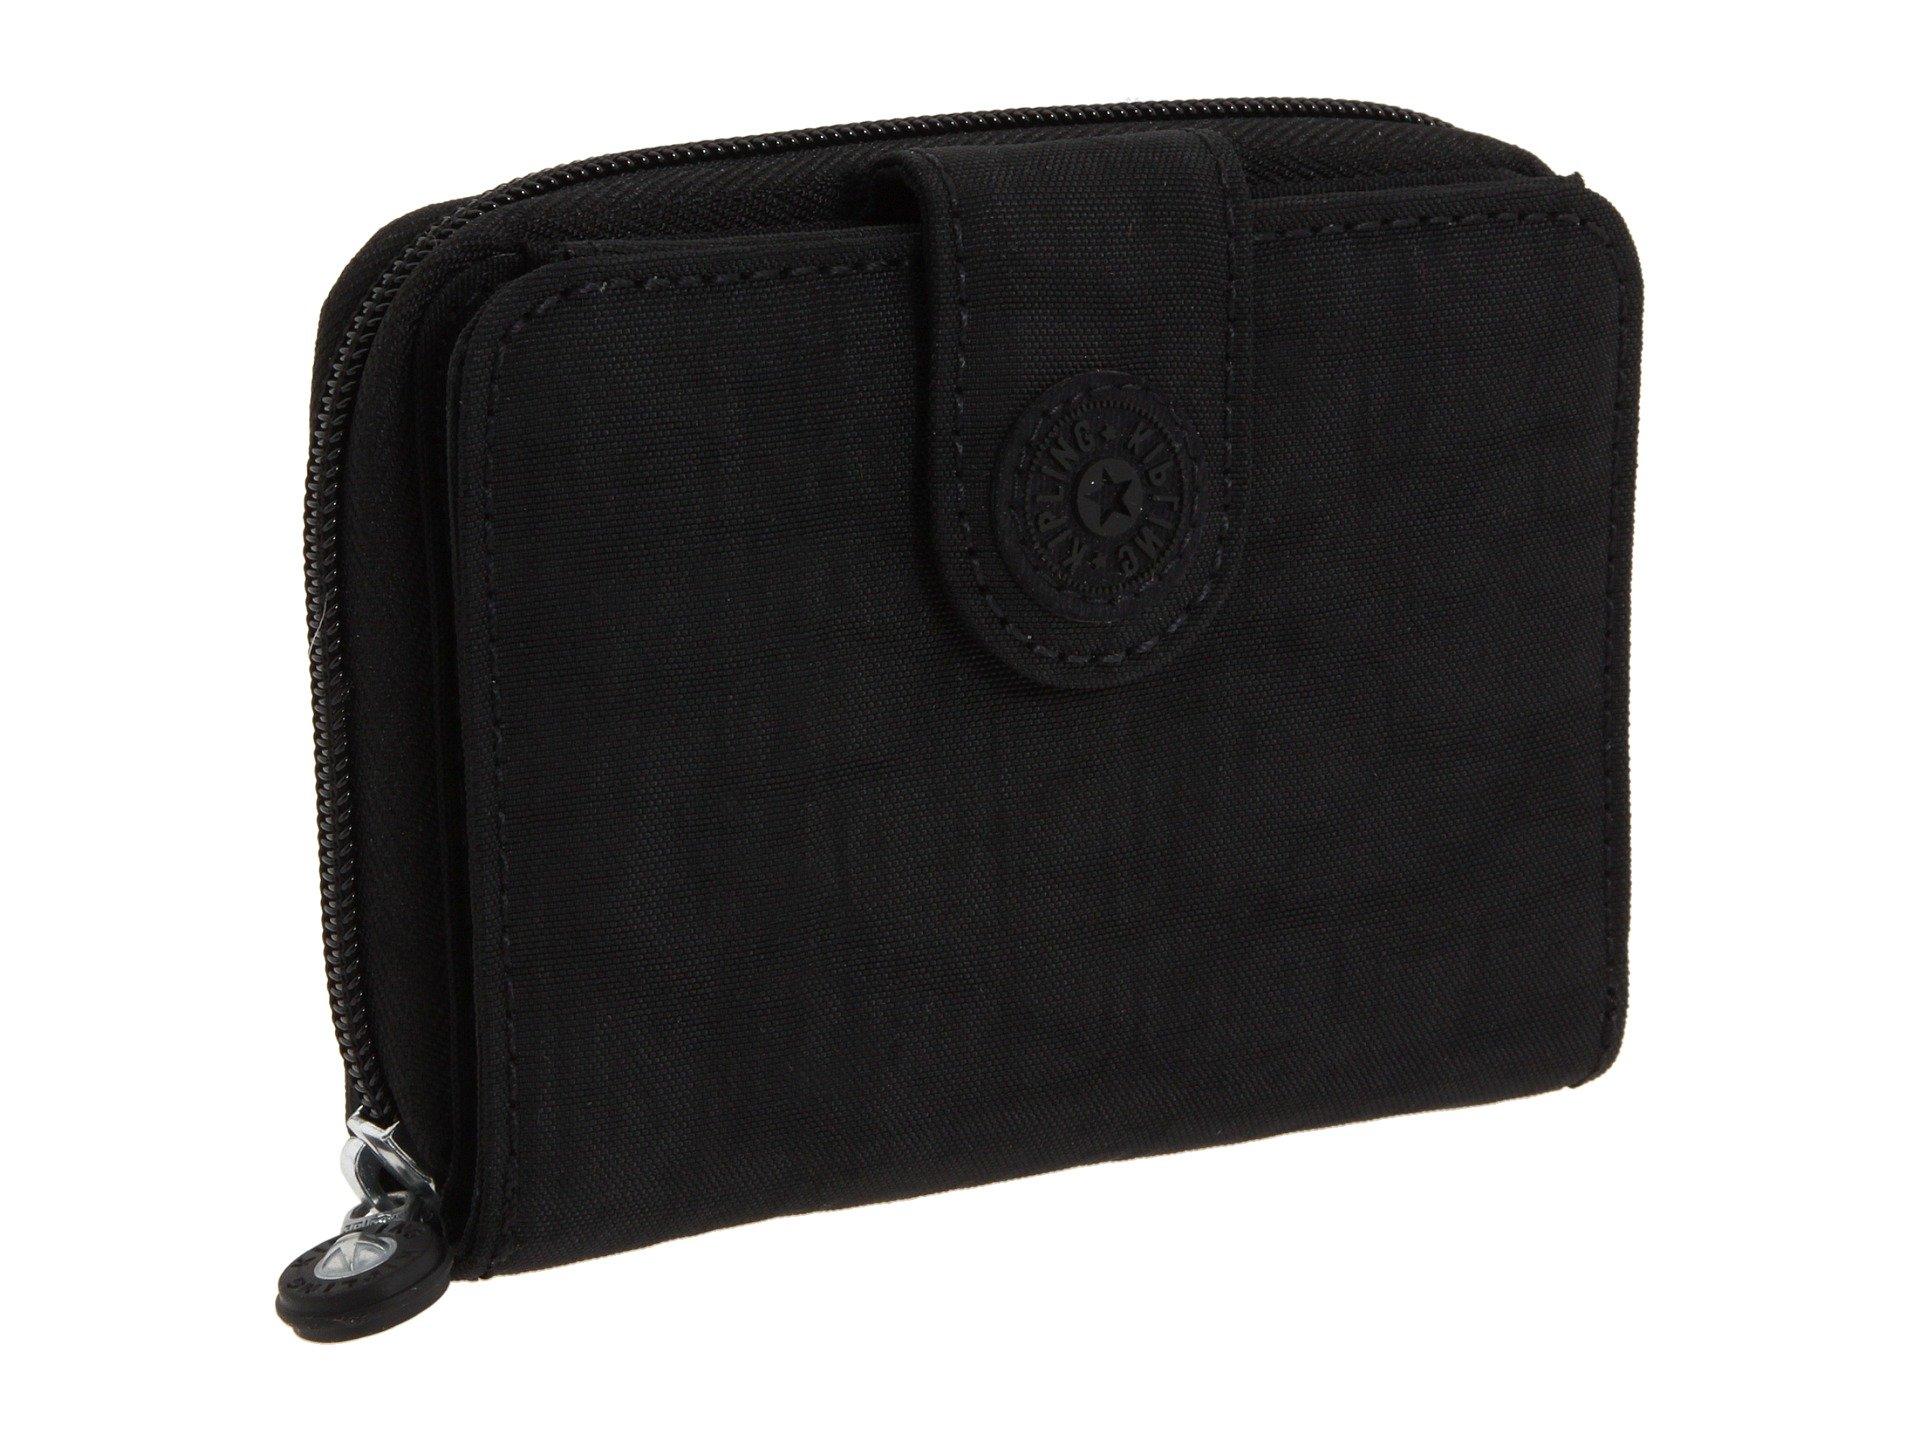 Wallet Kipling Black New Deluxe Money qppTAtwB